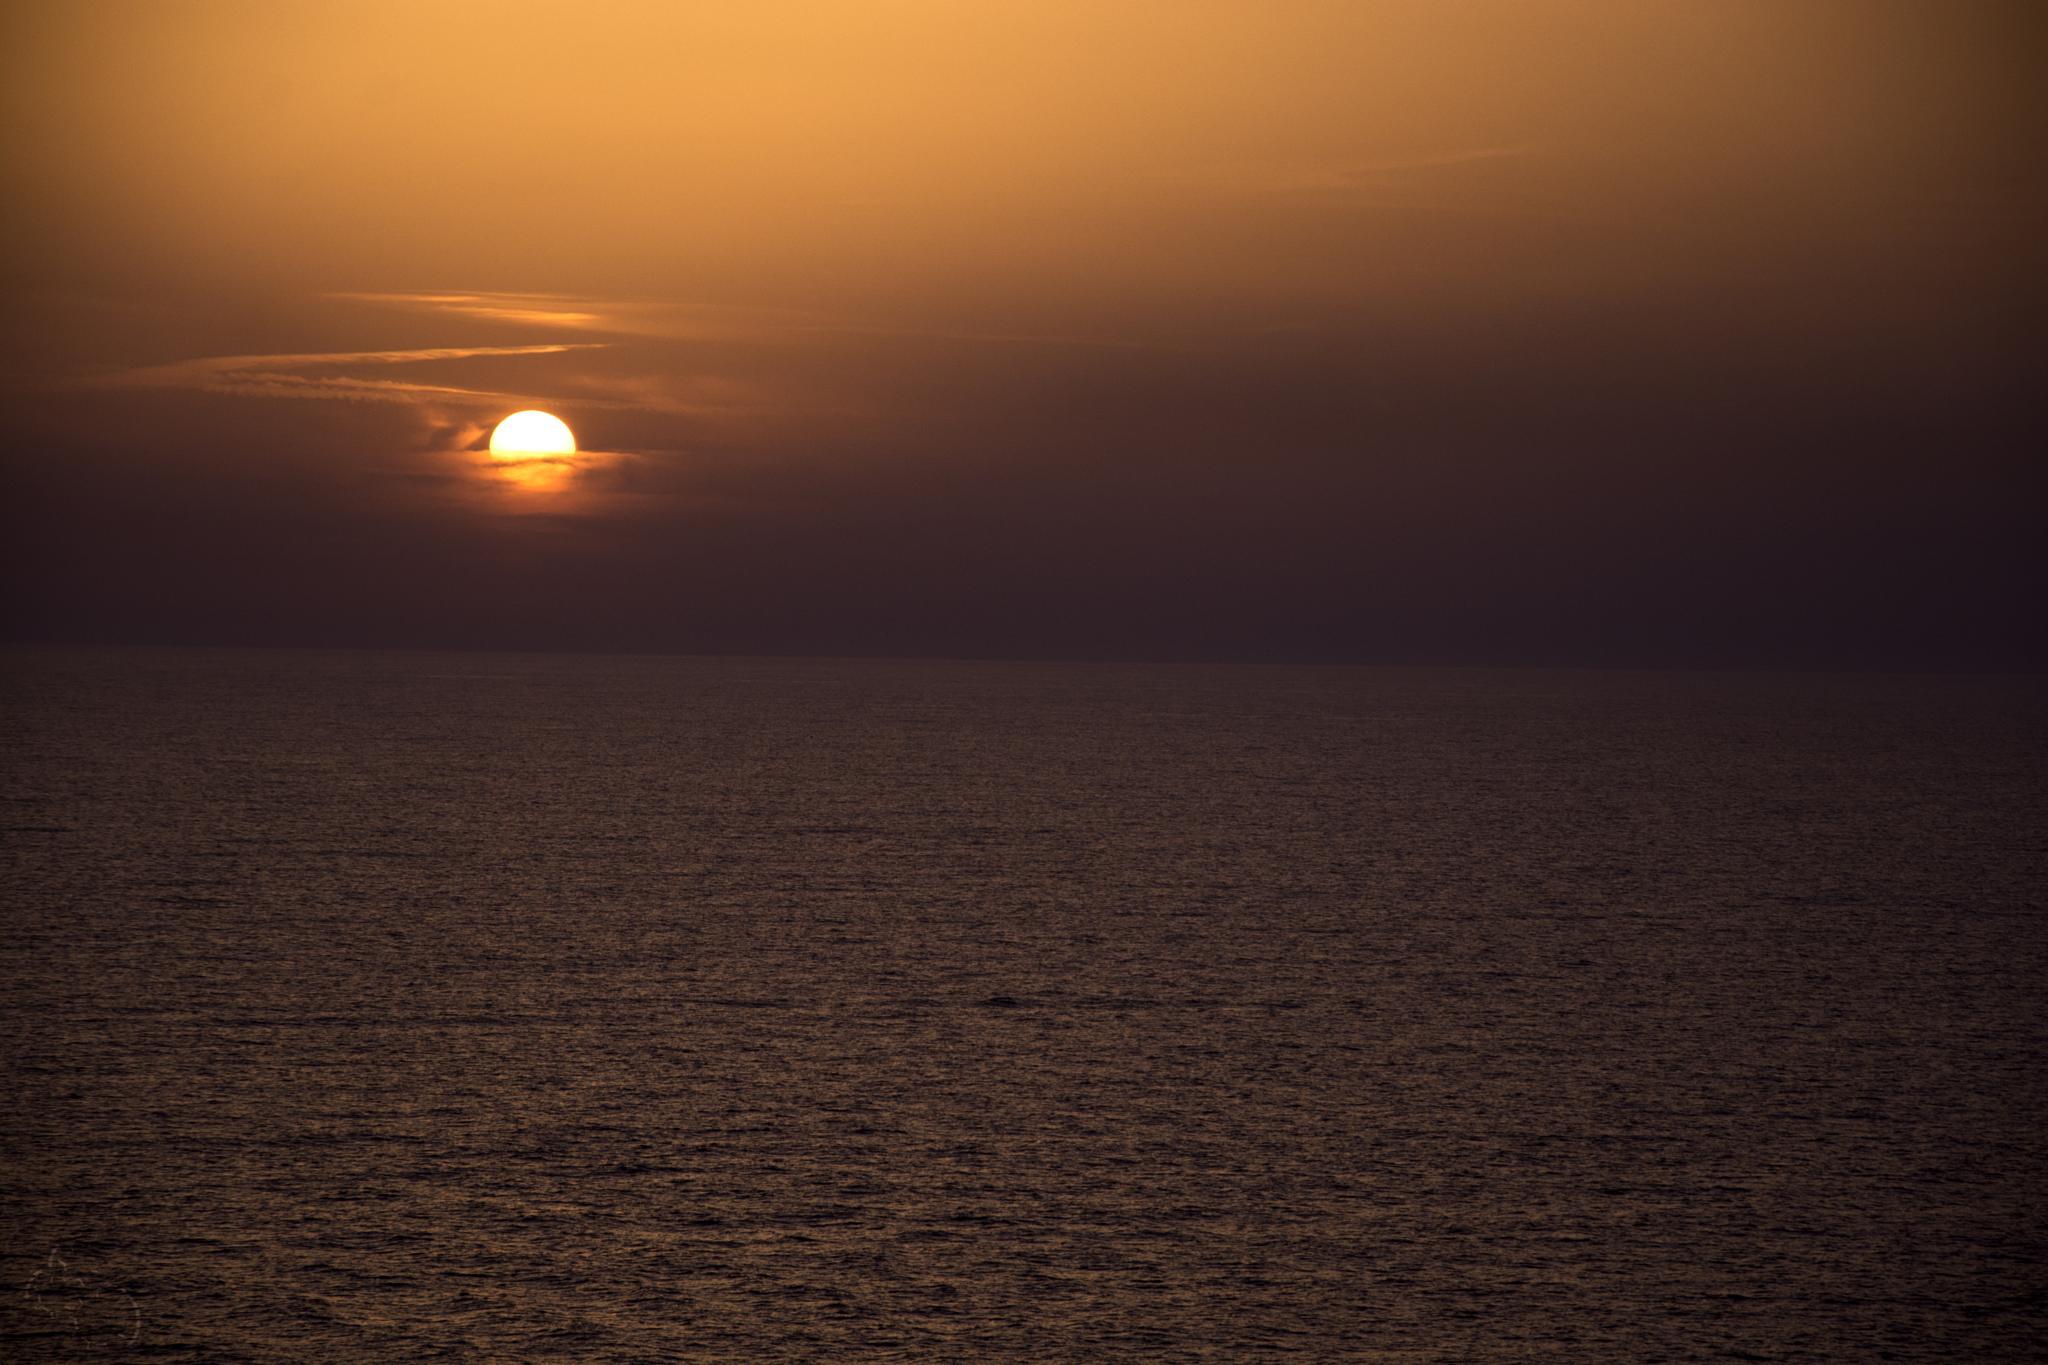 sunset by Bernie Lamberz photography